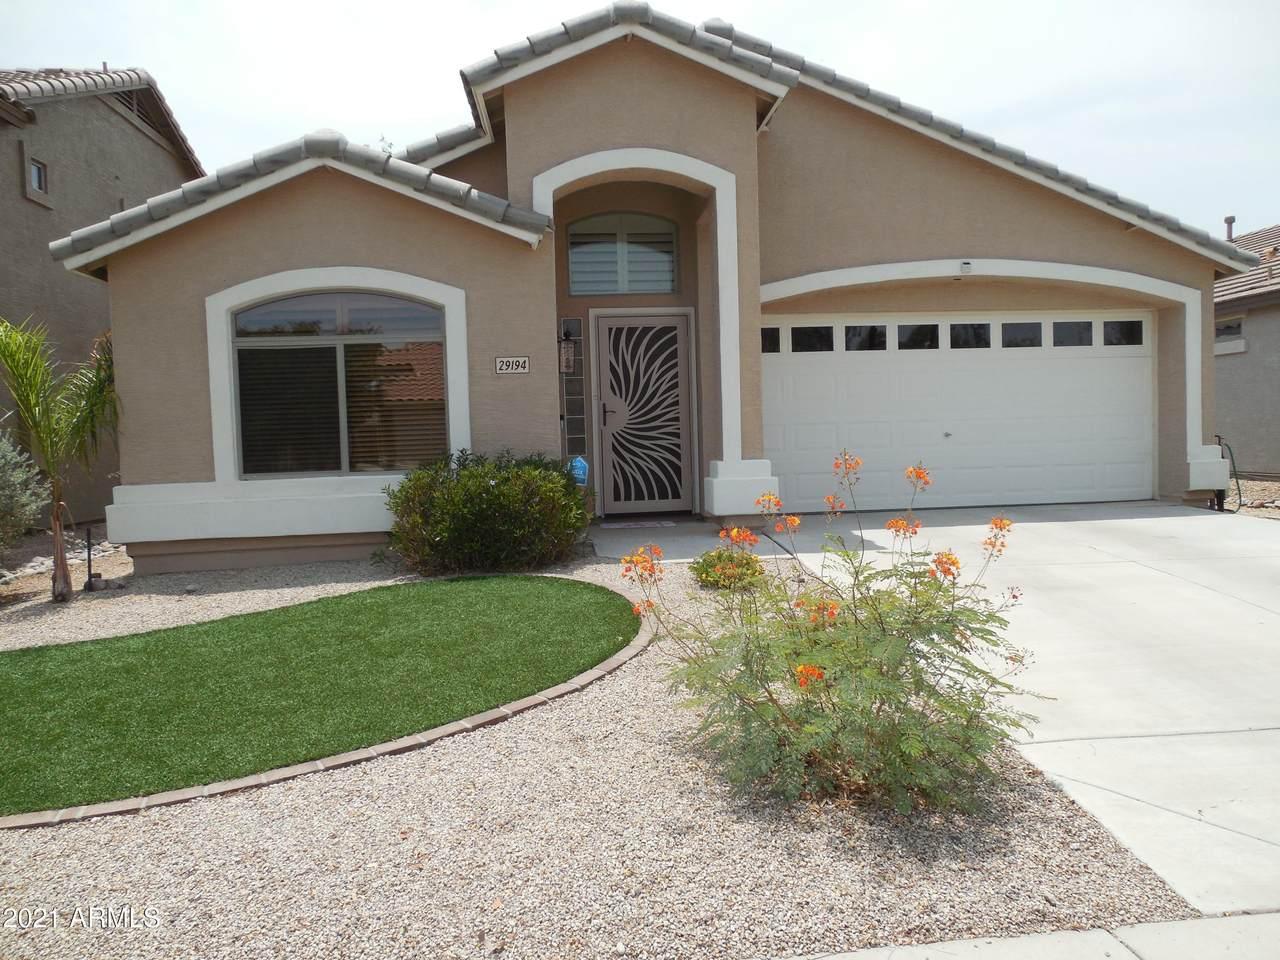 29194 Rosewood Drive - Photo 1